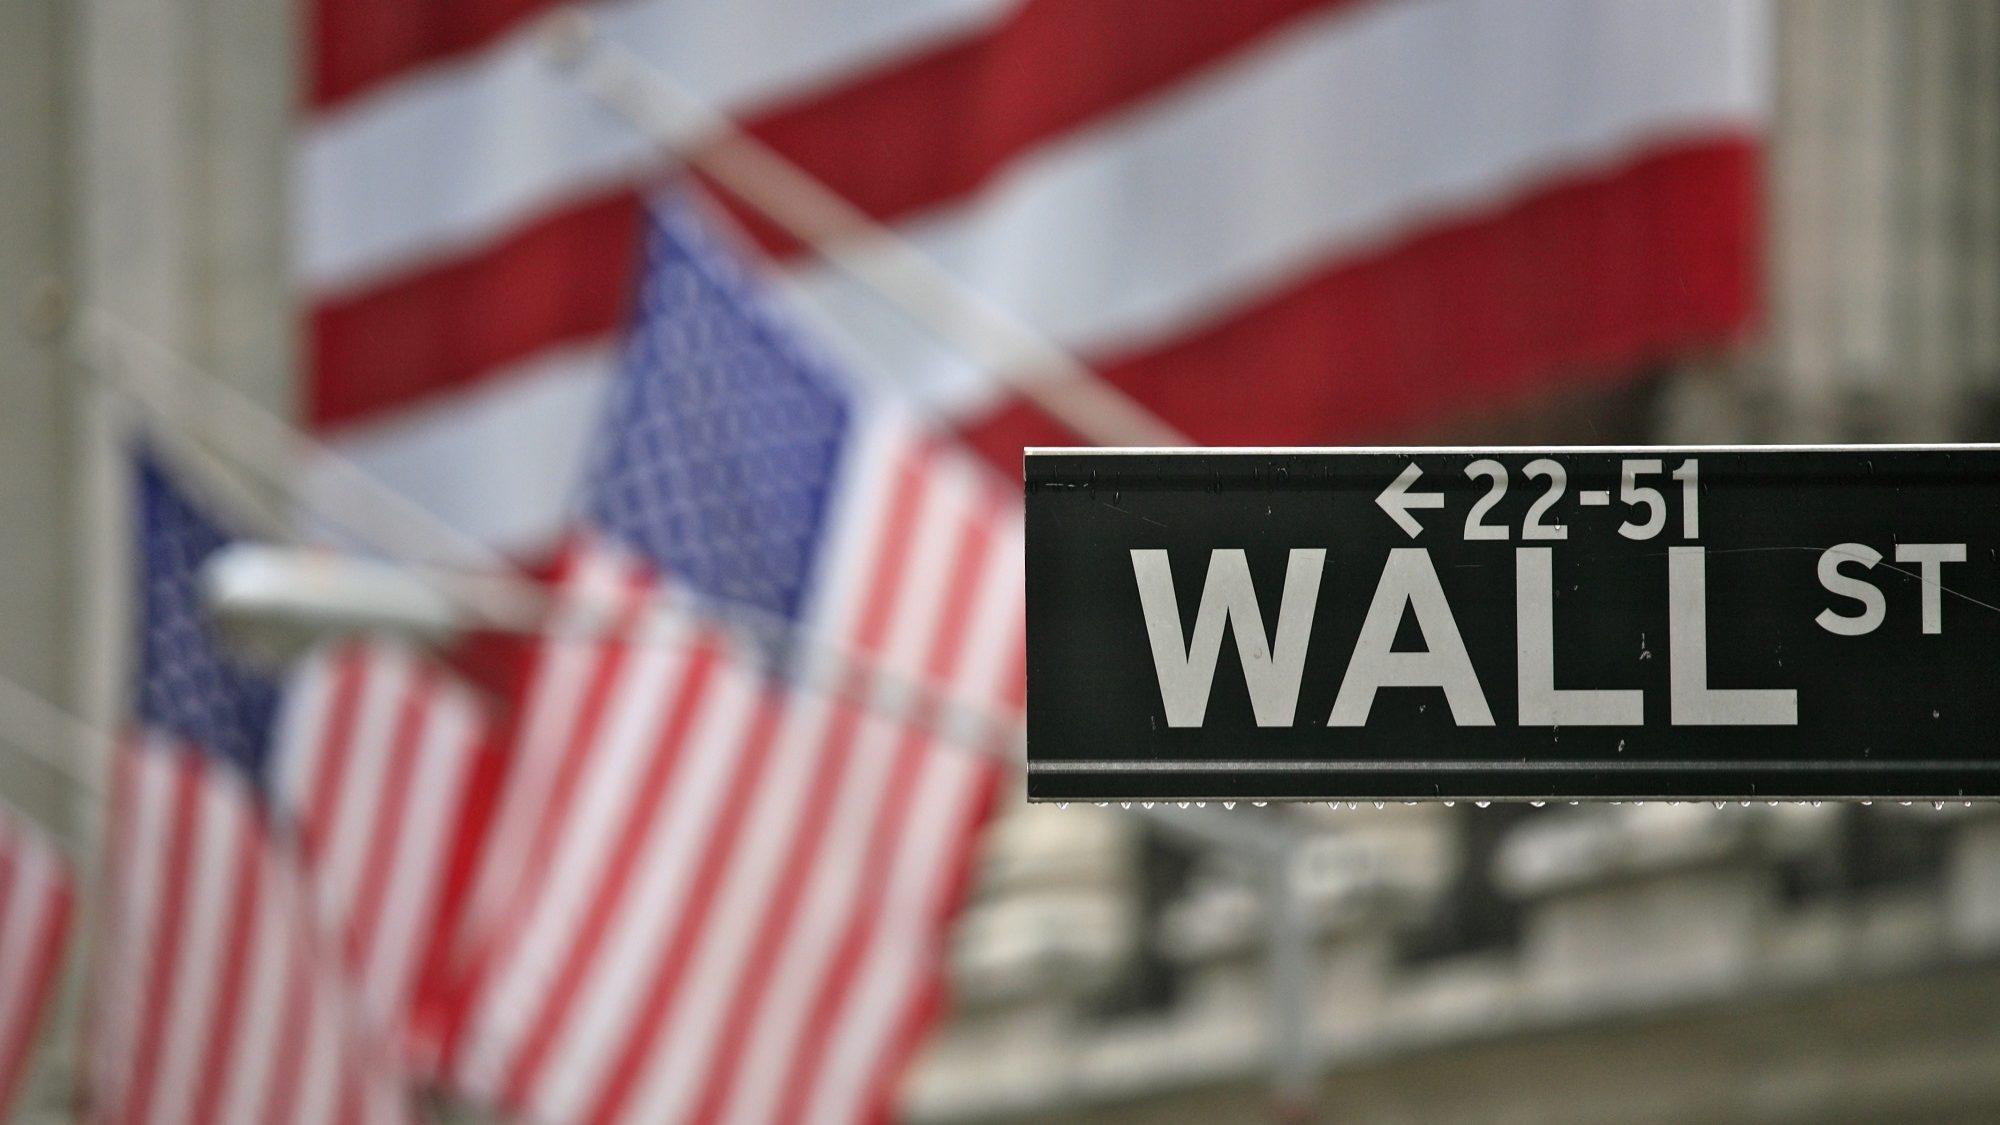 Wall Street inverte tendência. Nasdaq escapa às perdas